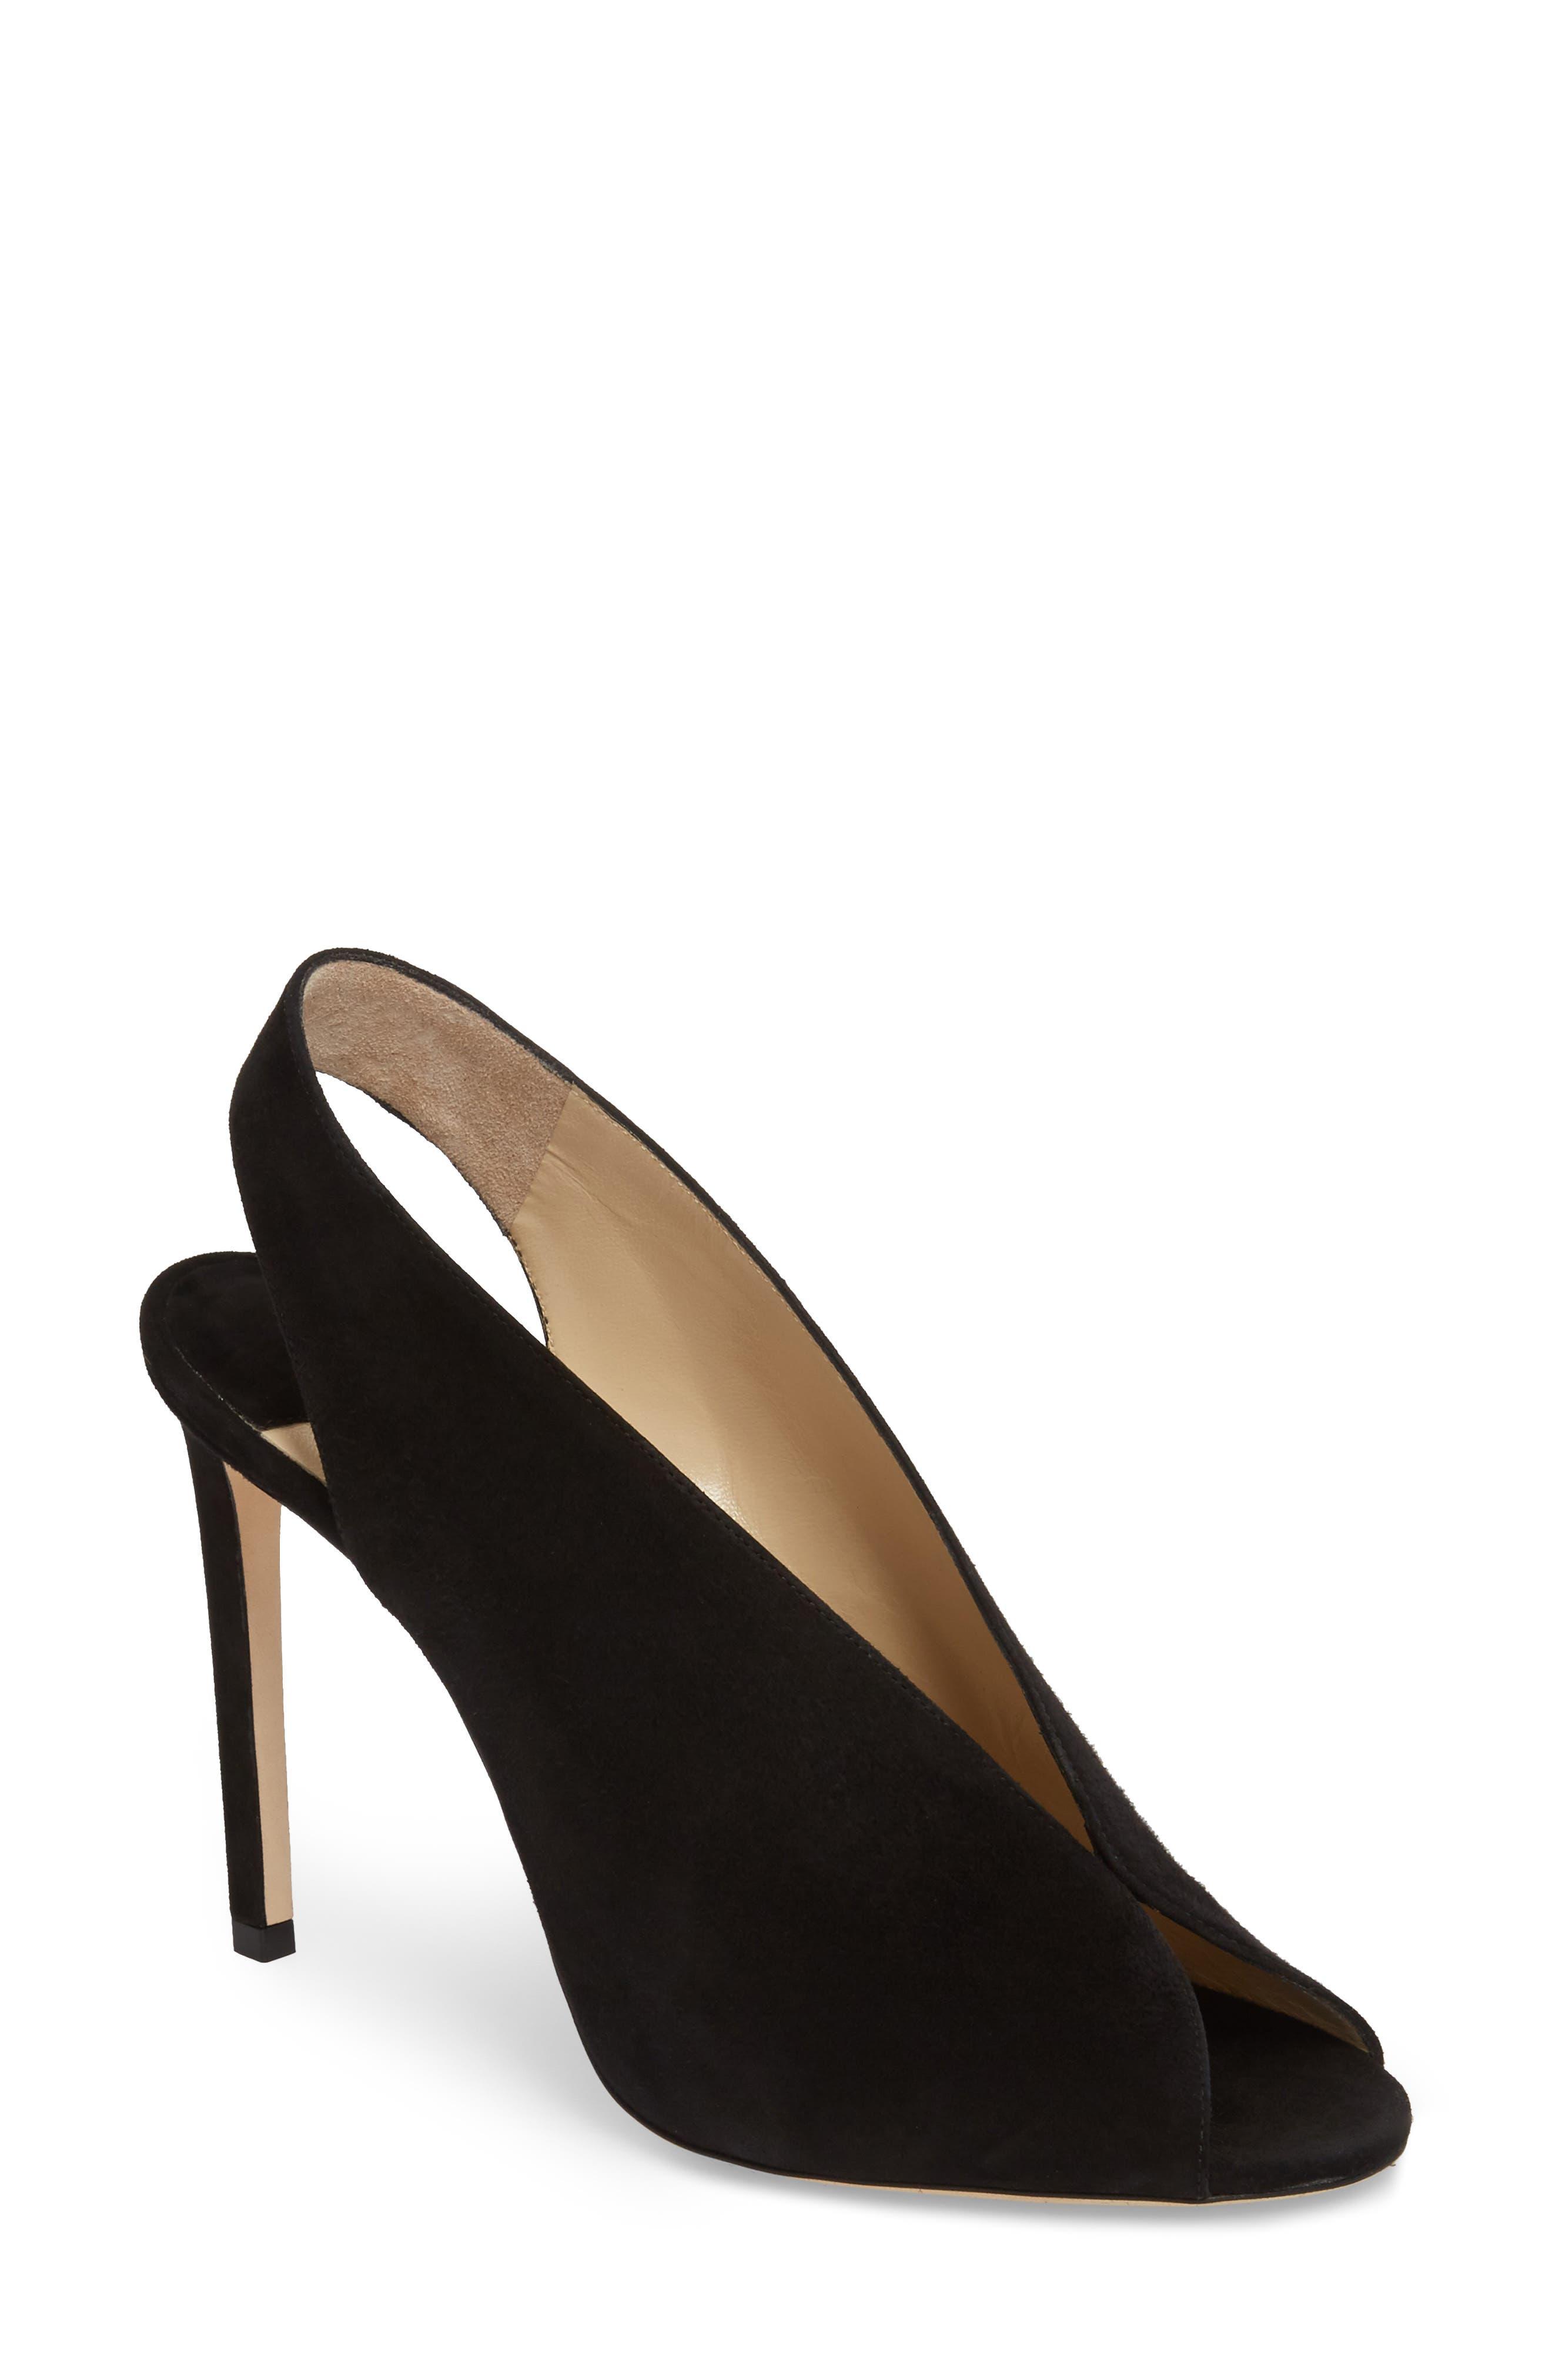 Shar Peep Toe Slingback Pump,                         Main,                         color, Black